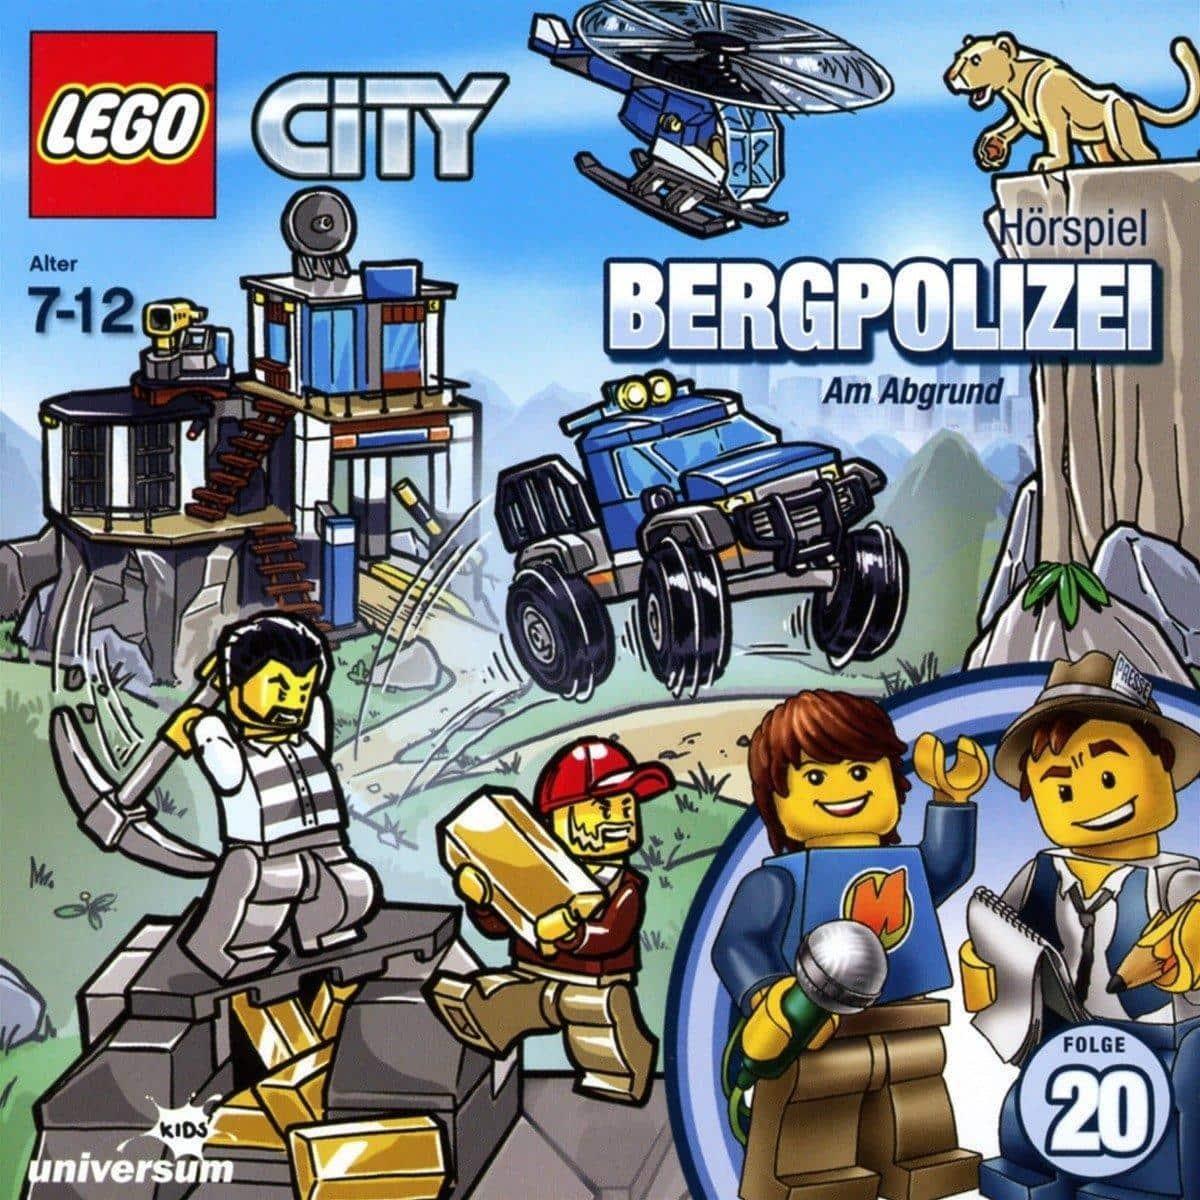 Lego City 20: Bergpolizei  (CD(s)) für 7,99 Euro